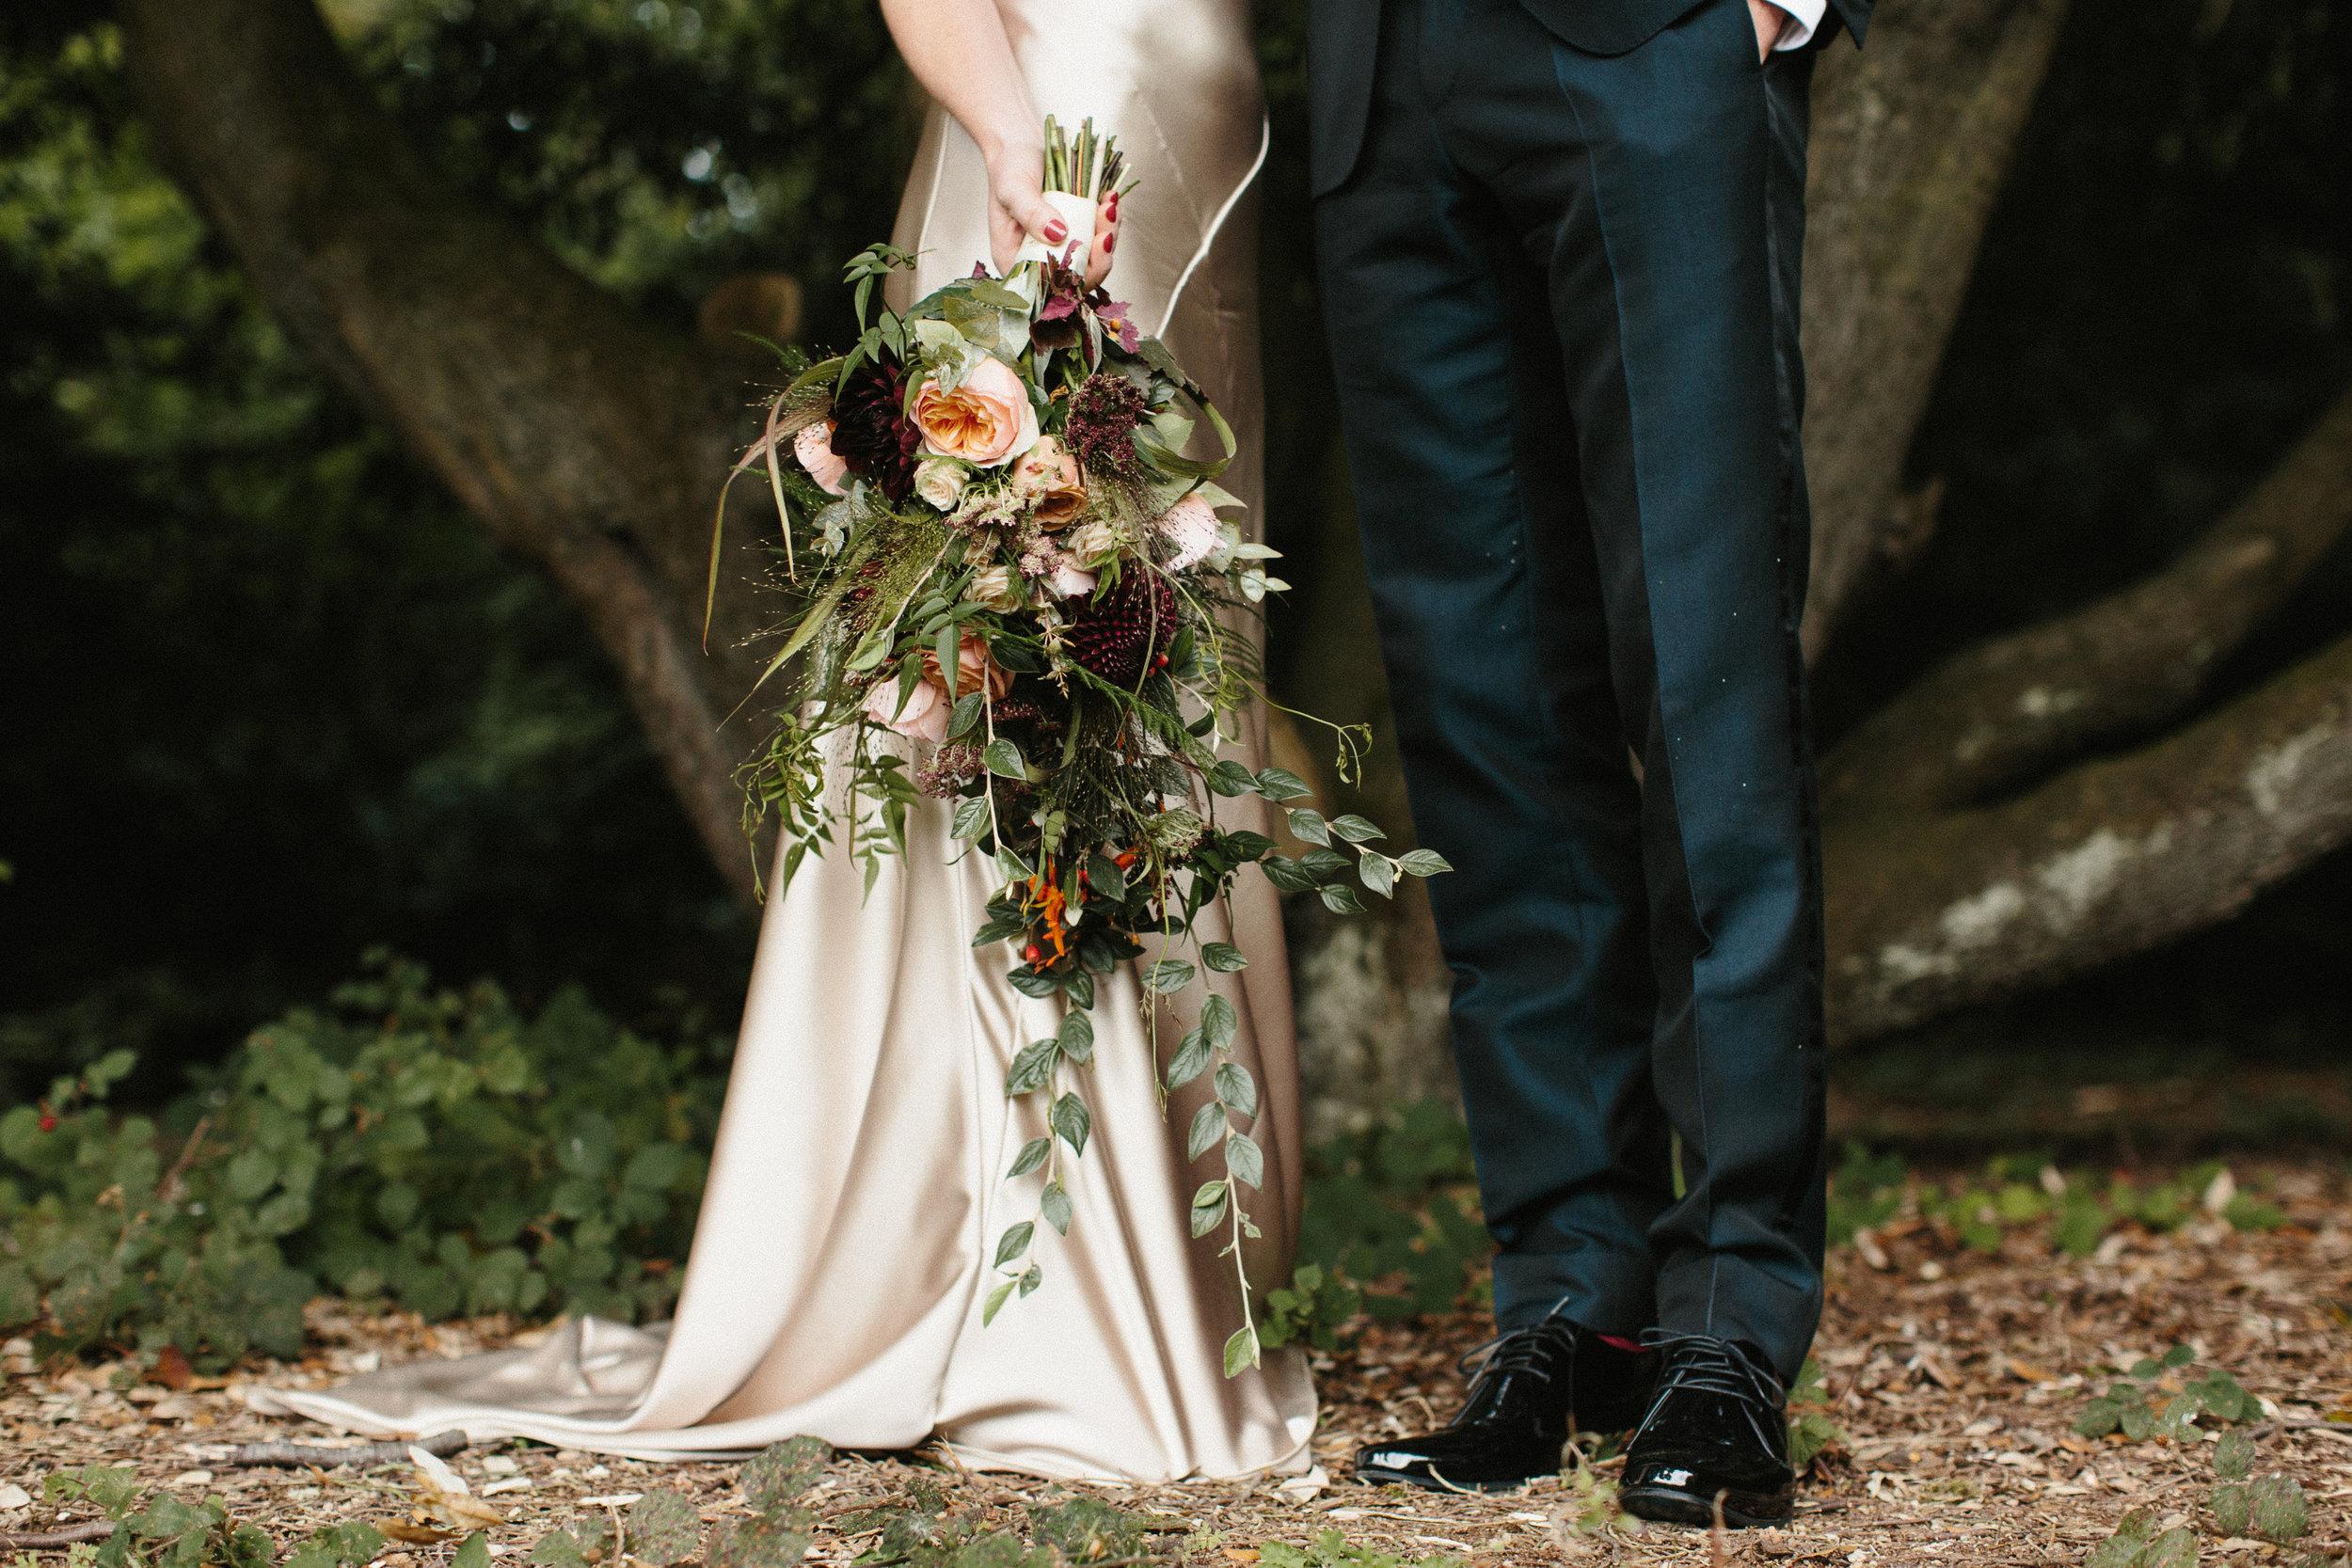 Kate-Beaumont-Sheffield-Honeysuckle-bias-cut-wedding-dress-oyster-Rosie35.jpg